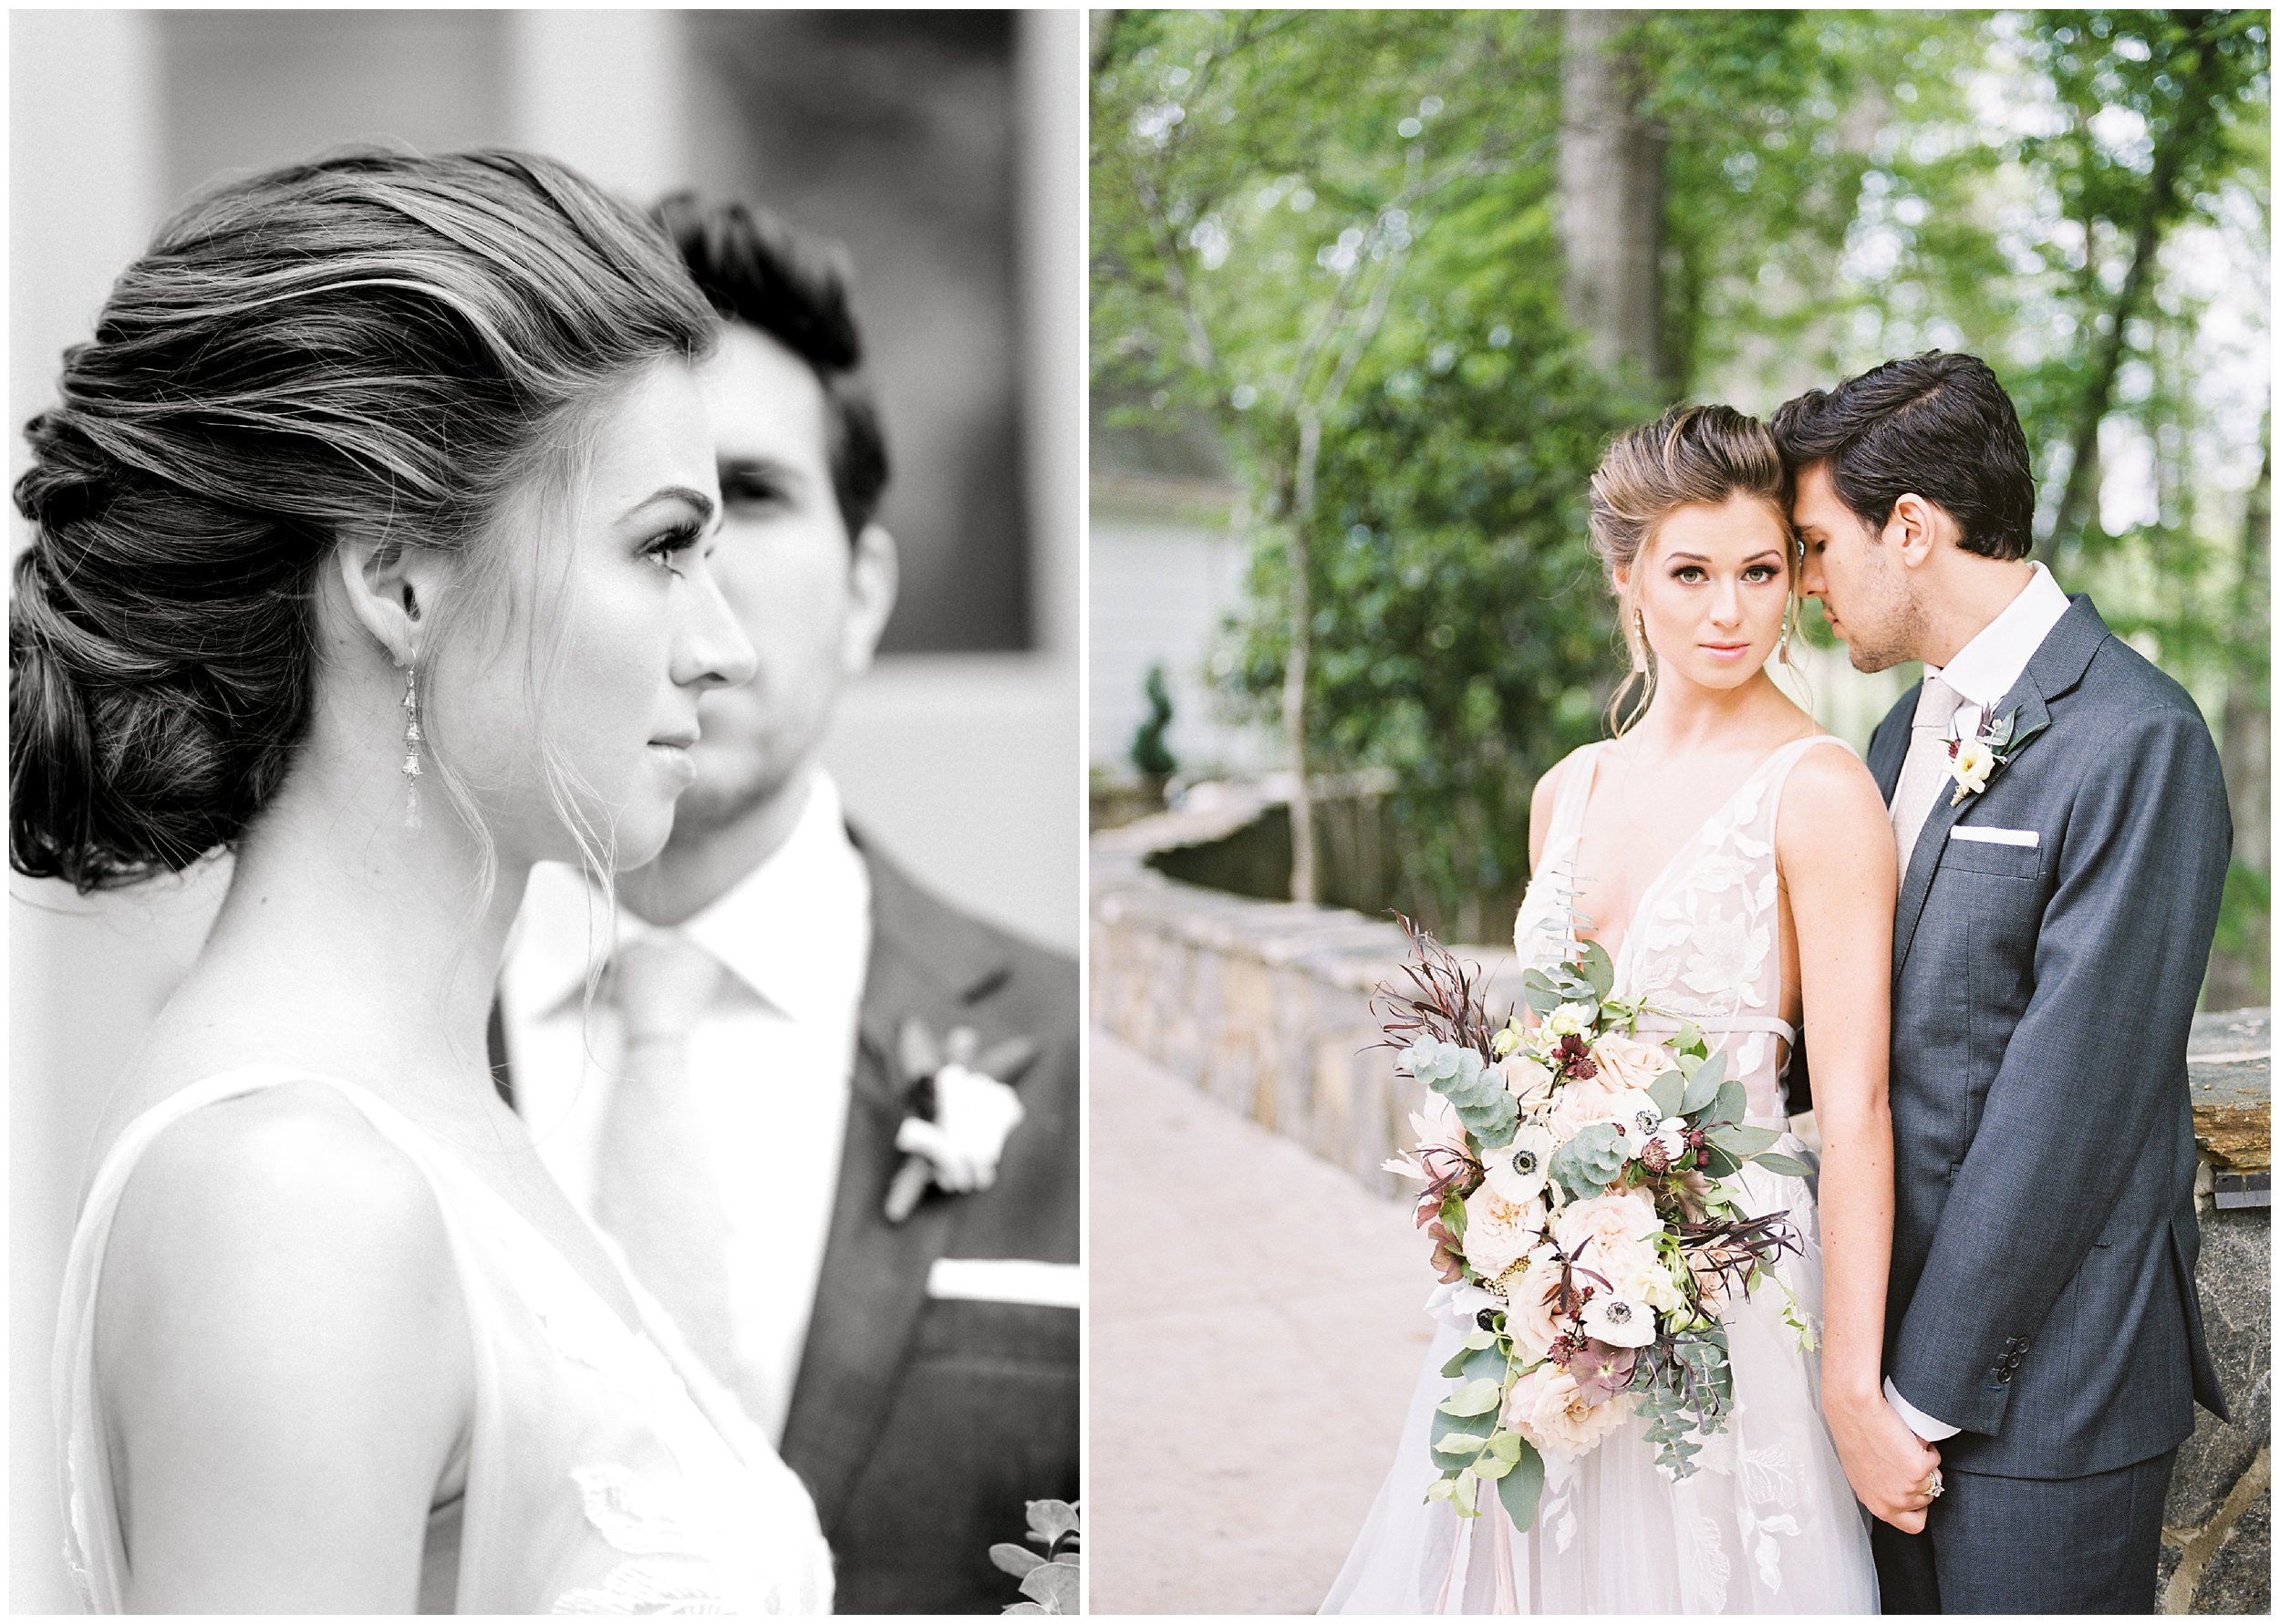 newlywed portraits